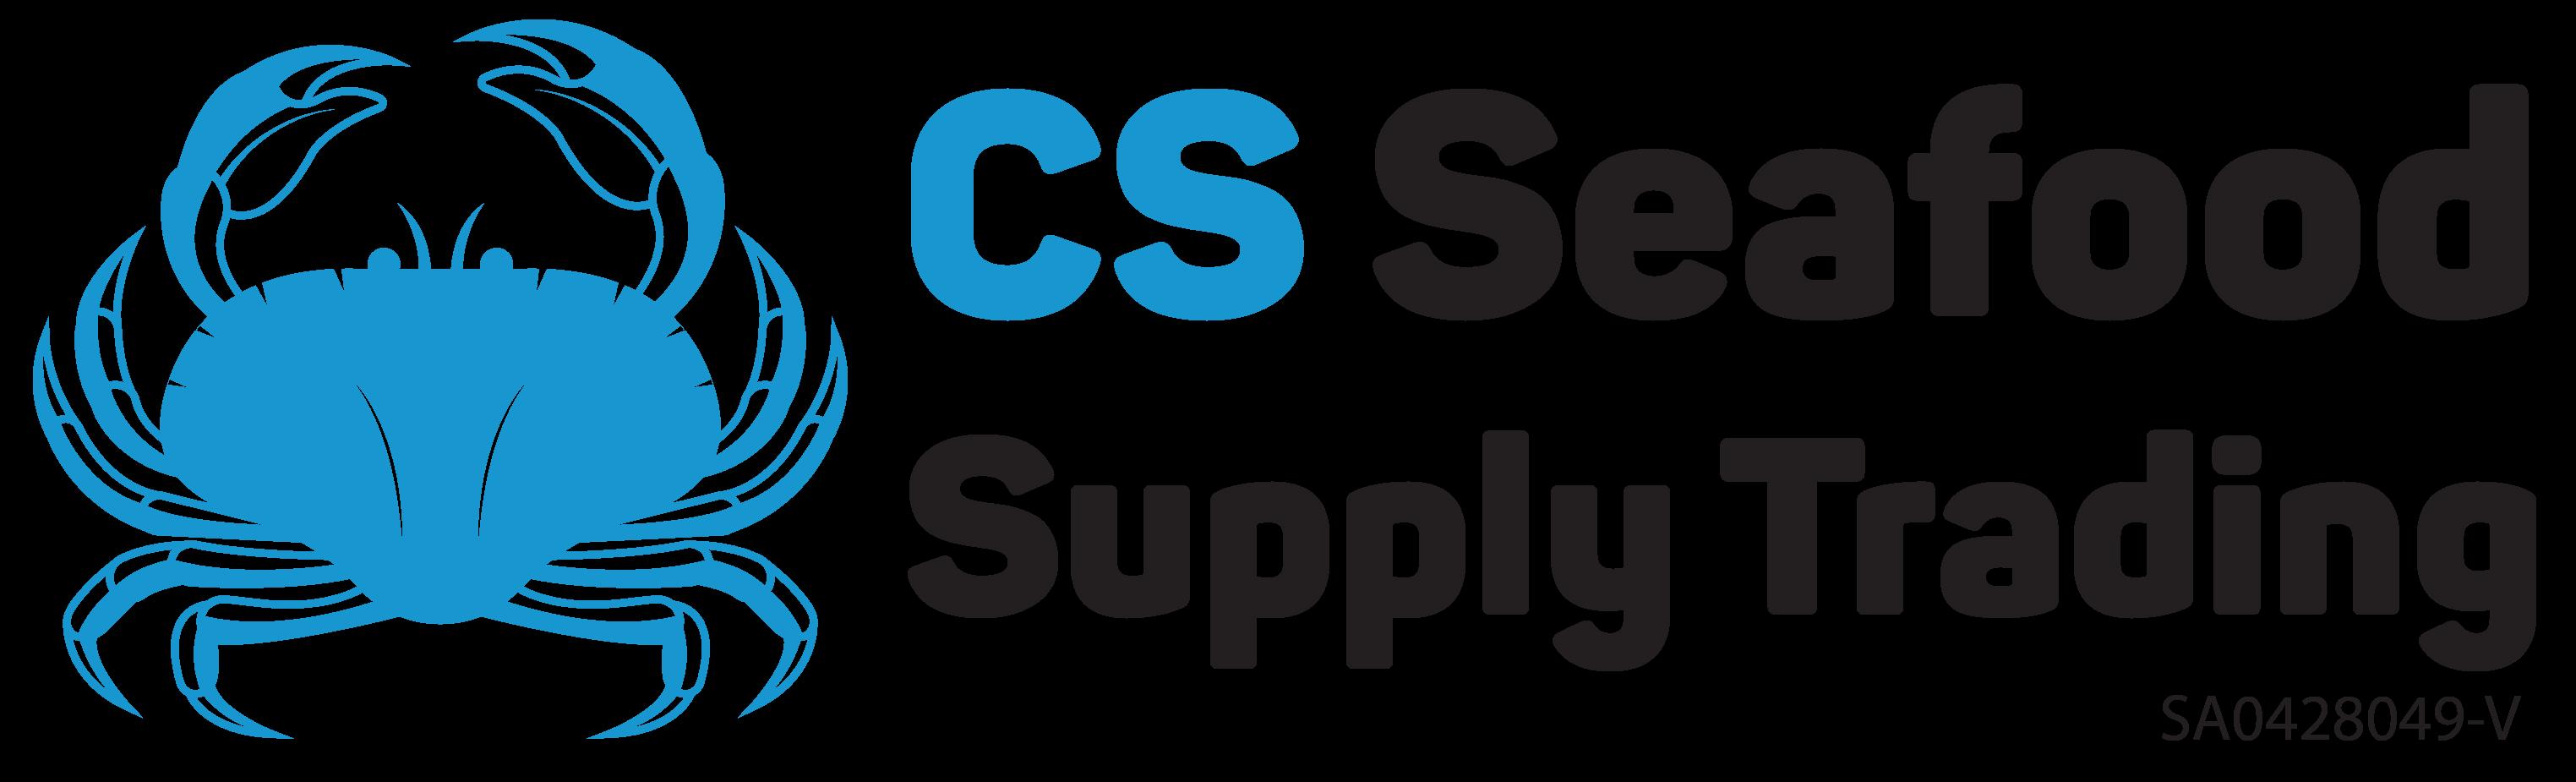 CS Seafood Supply Trading Malaysia